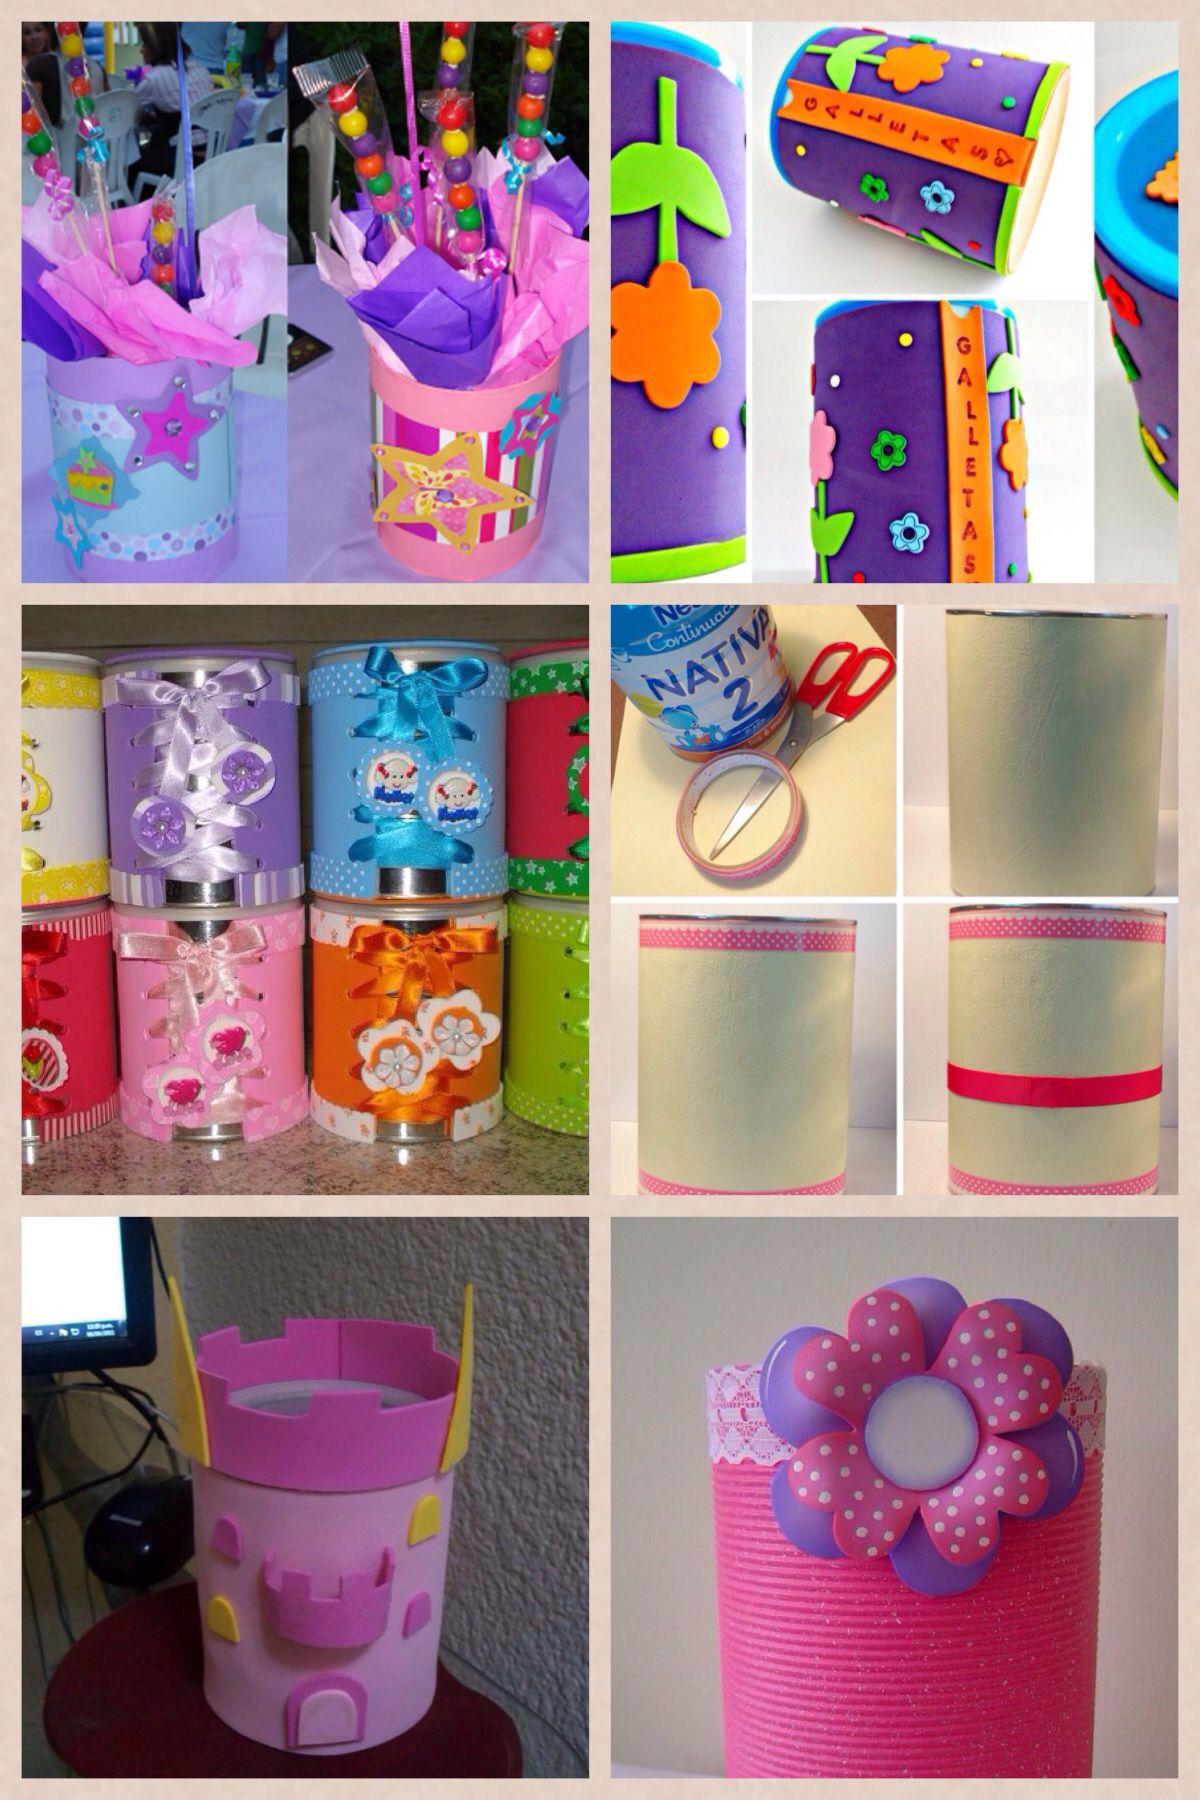 Ideas con latas leche de formula de beb luianys zulley - Manualidades con bebes ...